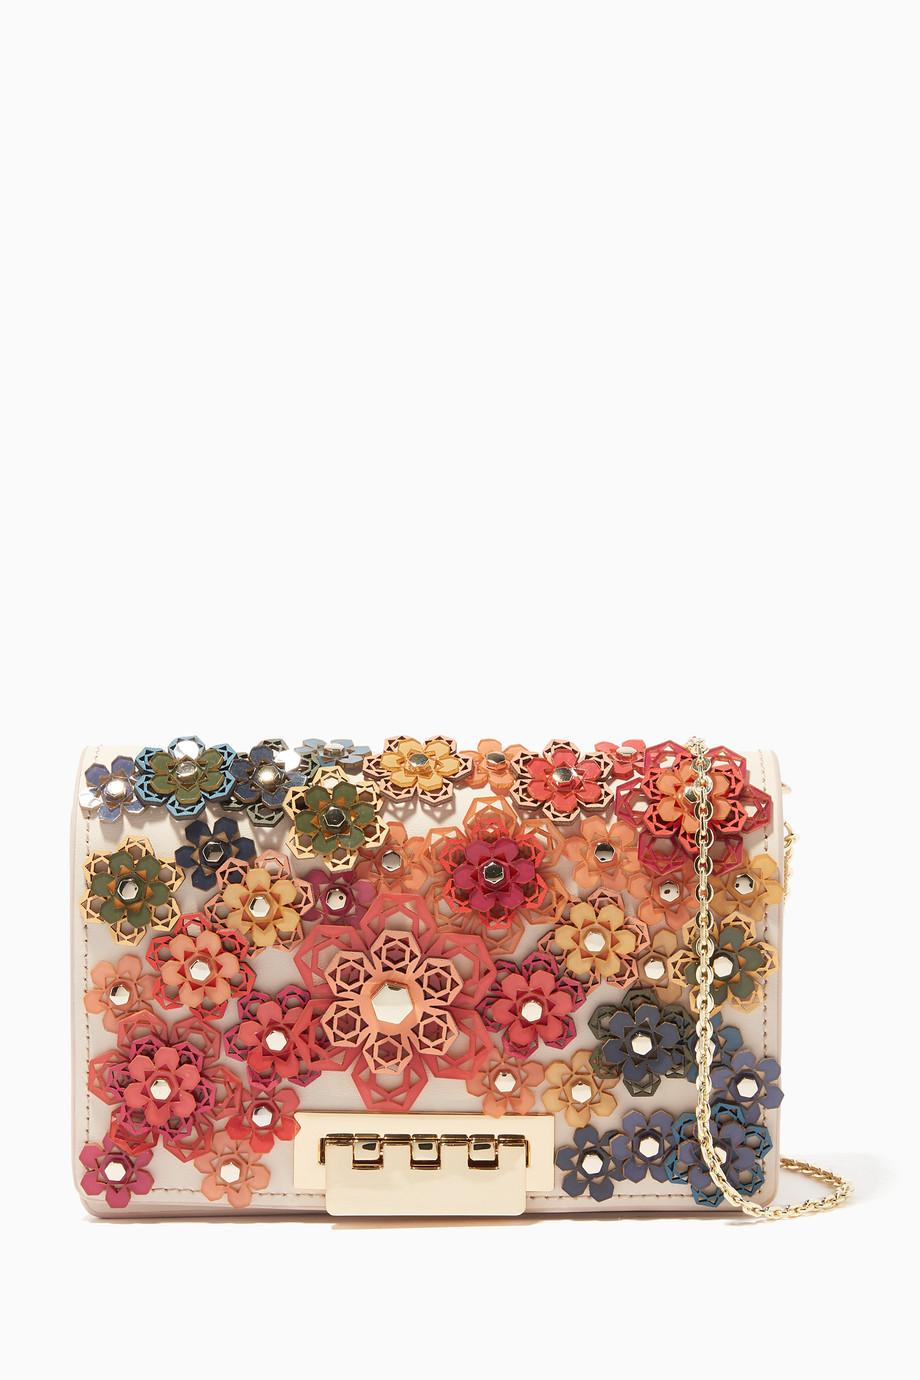 c64d89081c1 Shop ZAC Zac Posen Multicolour Cream Floral Earthette Accordion ...